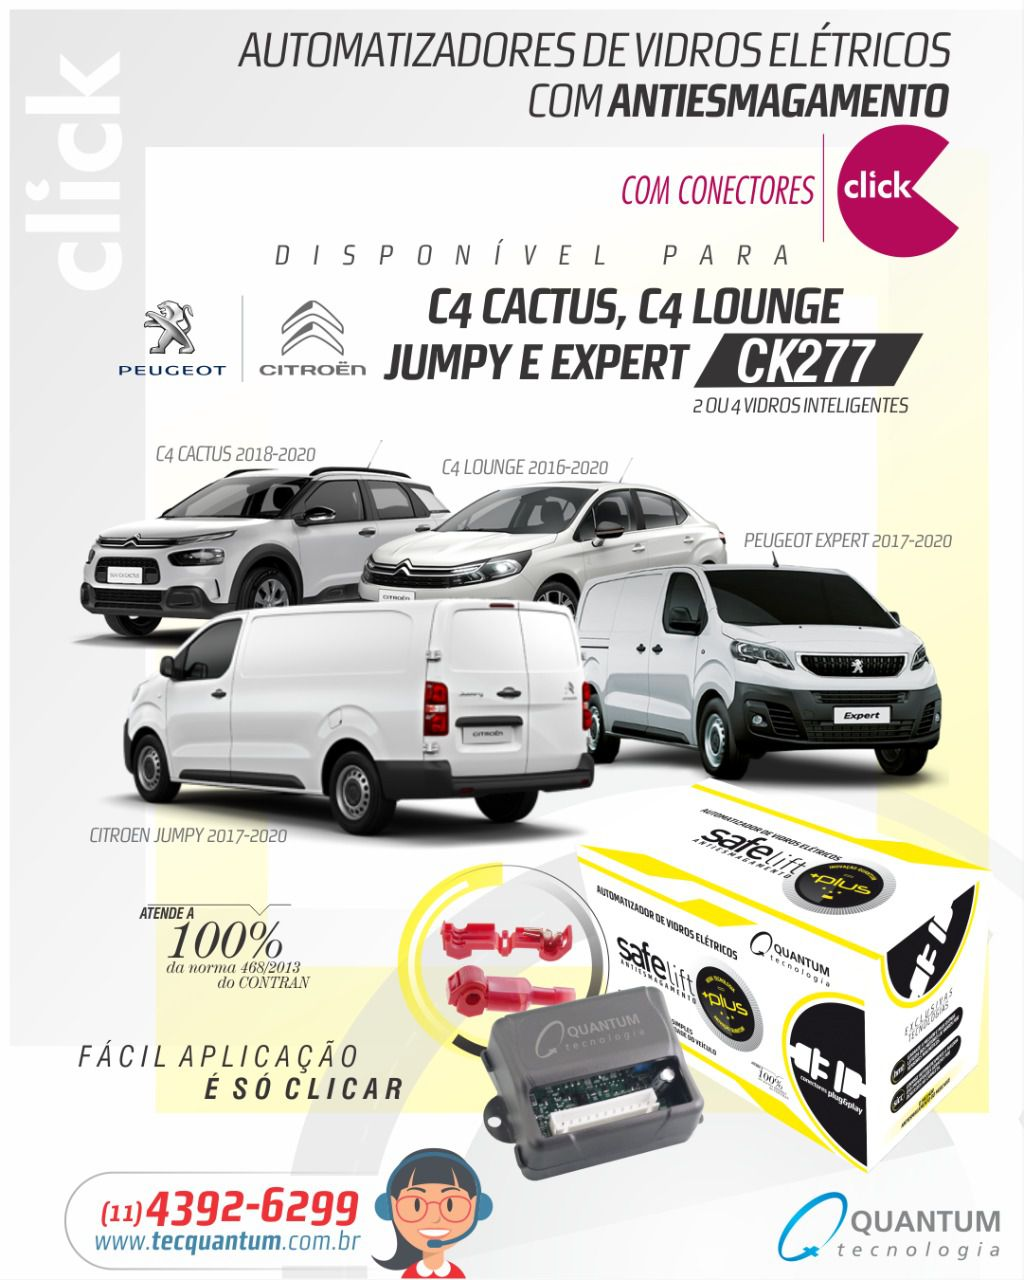 C4 Cactus, C4 Lounge, Citroen Jumpy, Peugeot Expert (2 ou 4 vidros inteligentes) CK277